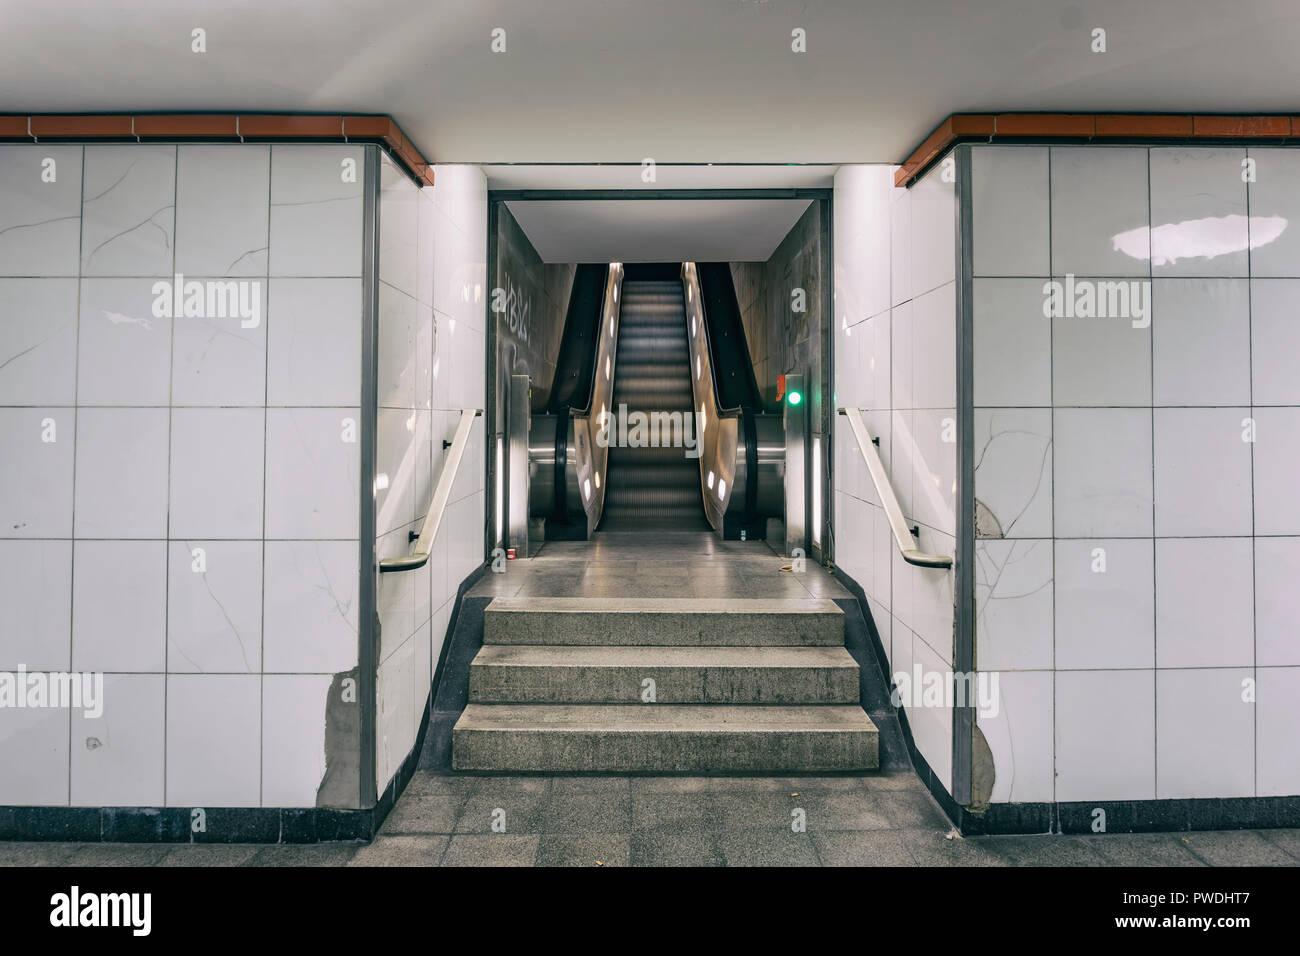 Berlin, Germany, October 10, 2018: Escalator at Underground Railway Station Stock Photo